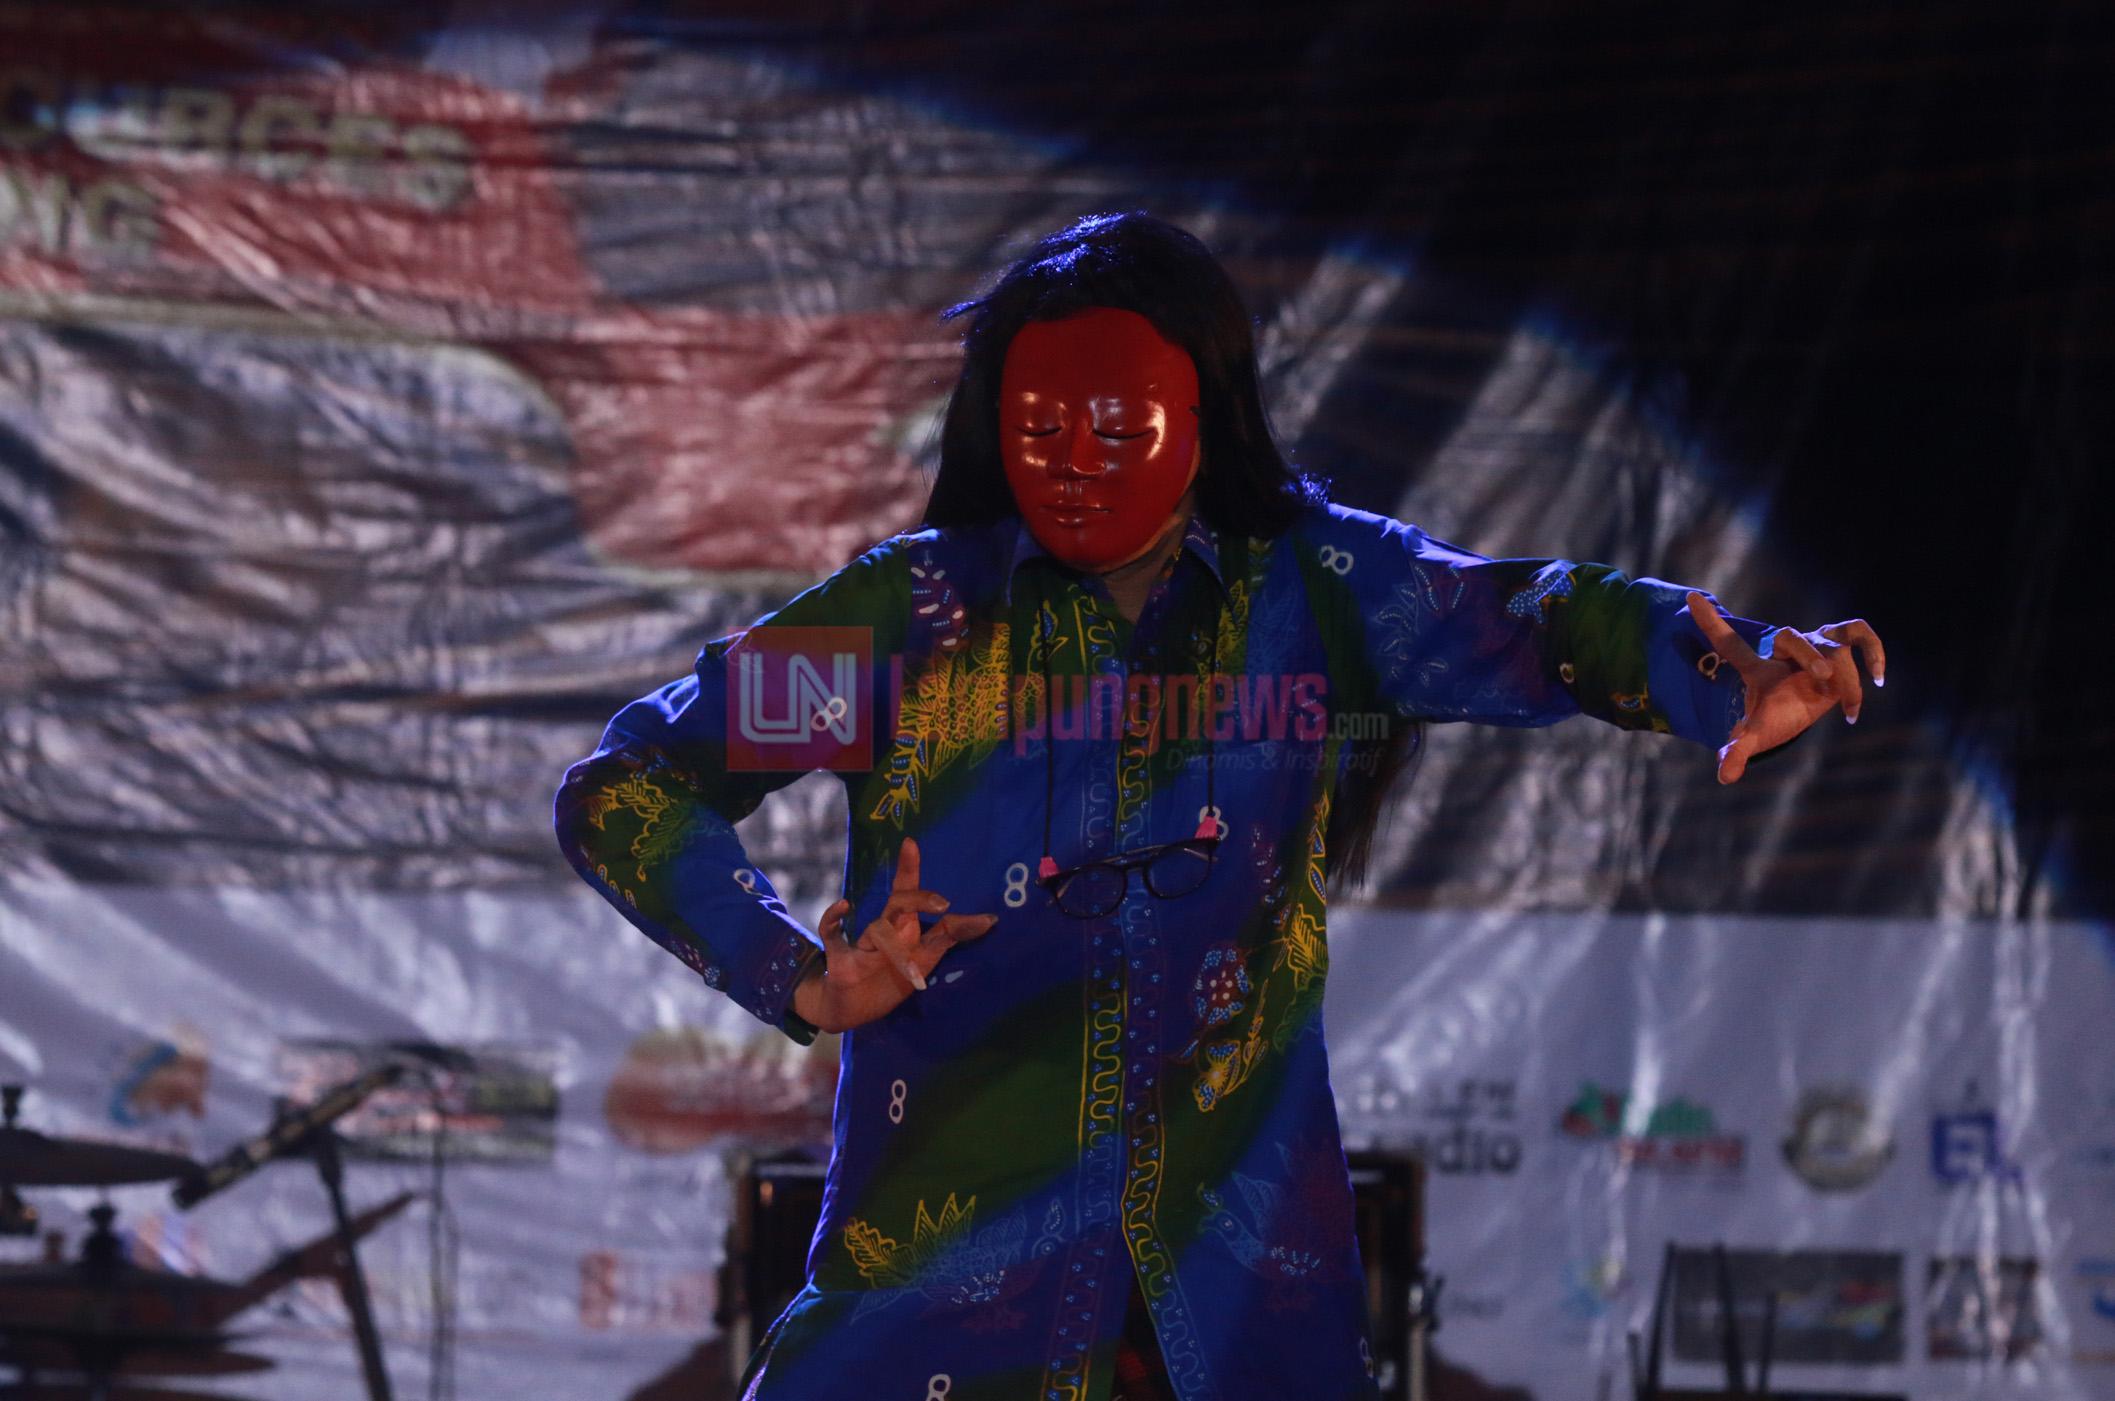 Aksi seniman Indonesia Didi Nini Thowok yang menunjukkan koleksi topeng dan tarian topeng khas miliknya di acara kebudayaan Care Of Lampung di GSG Unila, Jumat (12/1). Selain penampilan Didi, acara yang diselenggarakan Prodi Seni Tari Unila ini turut menampilkan tarian dan musik serta parade budaya tentang Lampung. (Lampungnews.com/El Shinta)